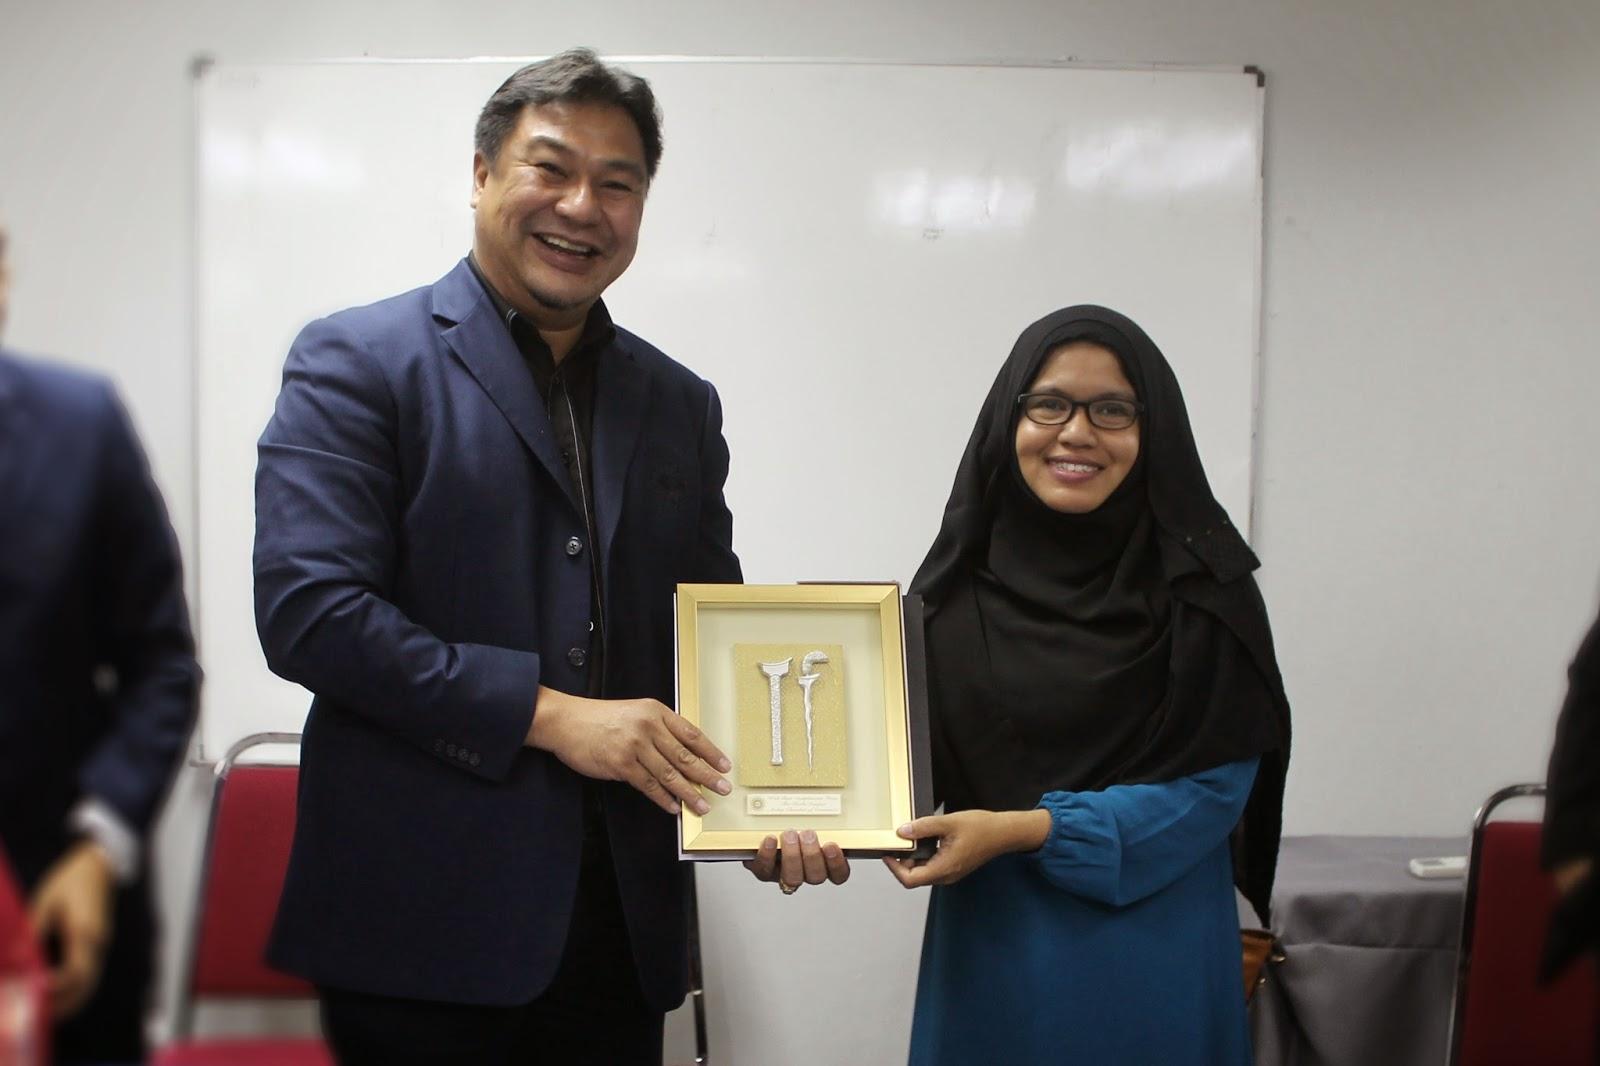 johor baharu cougar women Mohd izzuan hady coating tech_ crc-evans lokasi pasir gudang, johor, malaysia industri minyak & tenaga.